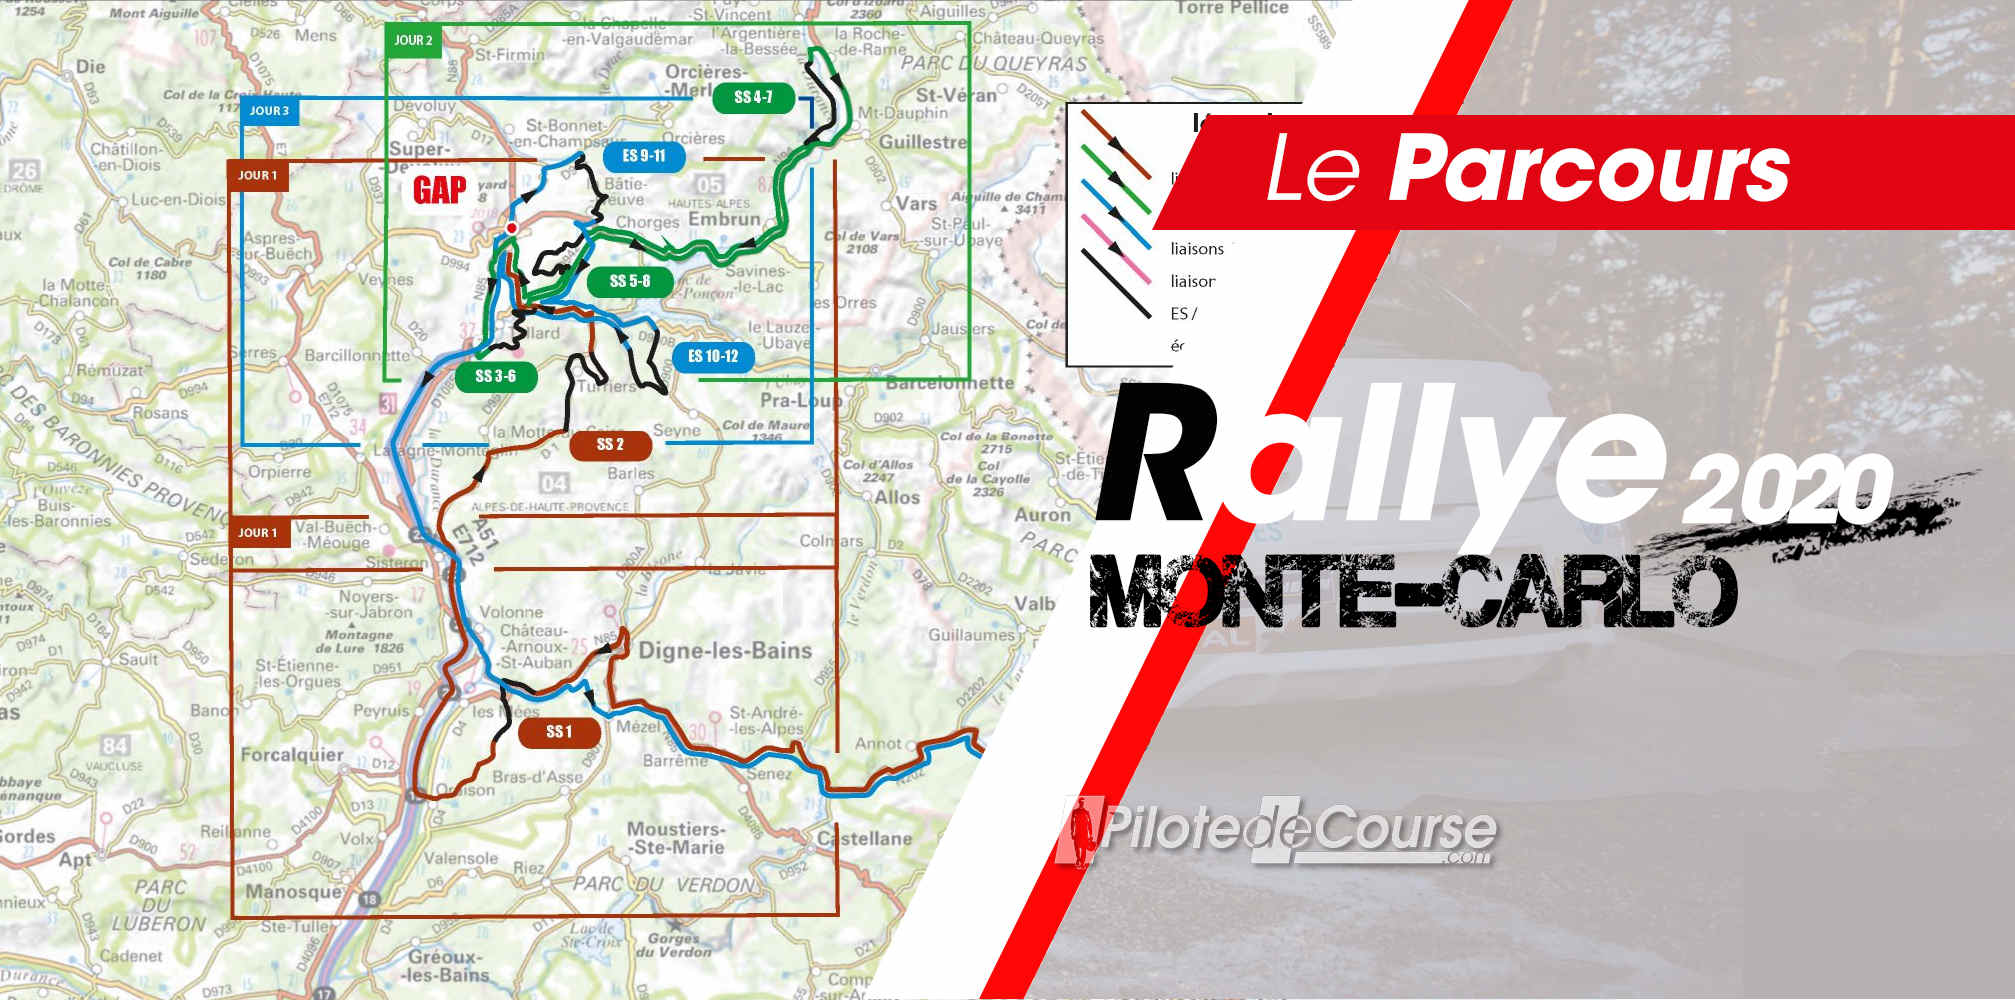 carte monte carlo 2020 Les spéciales du Rallye Monte Carlo 2020   Pilote de Course